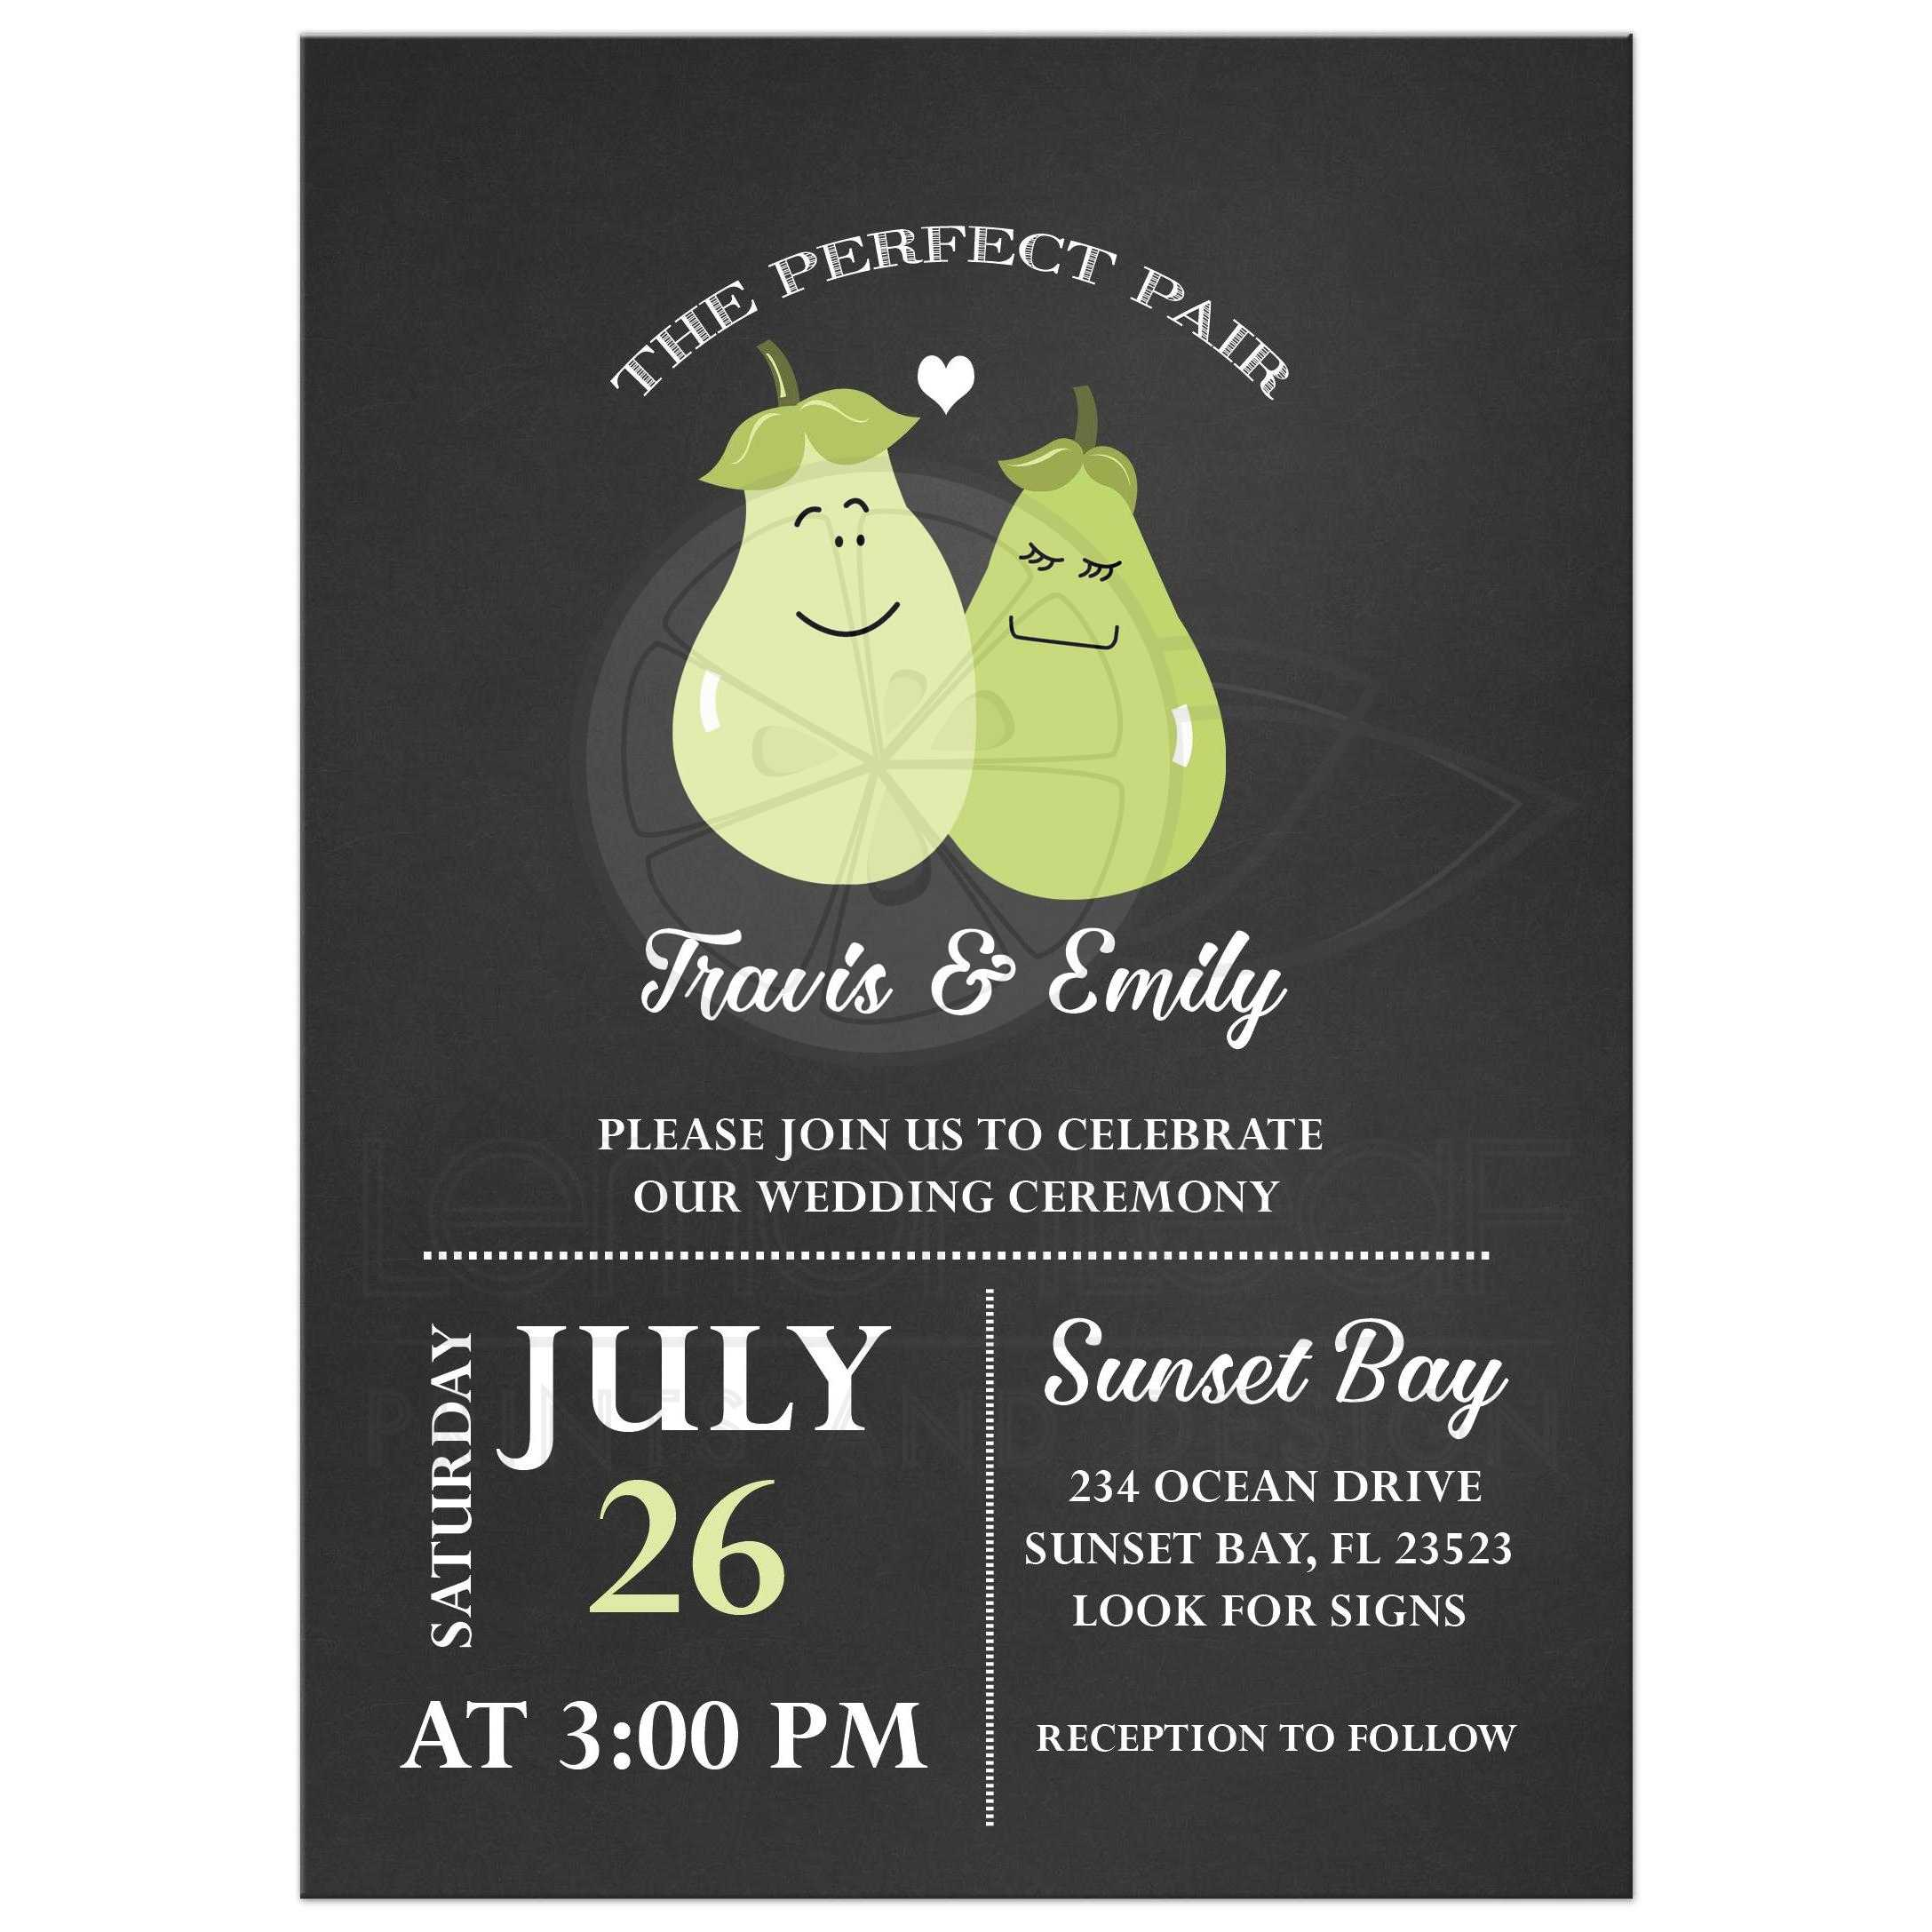 White And Party Graduation Black Invitations